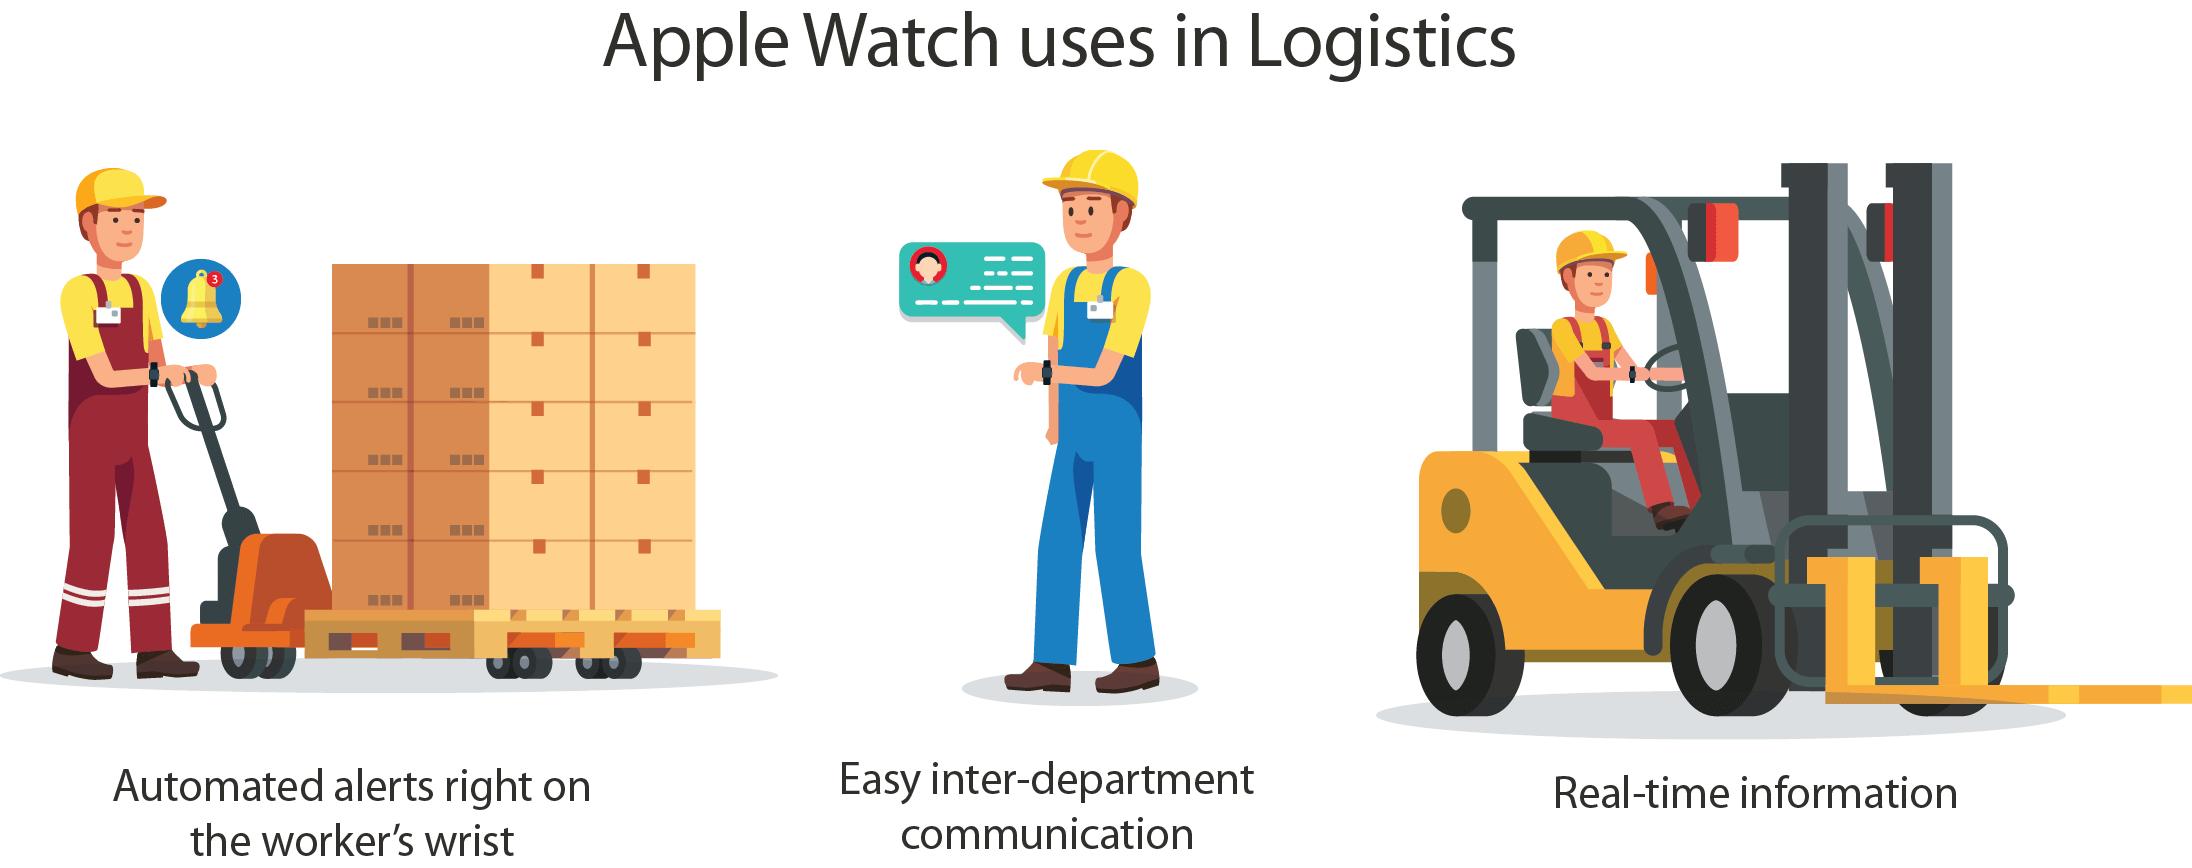 Apple Watch Logistics Section